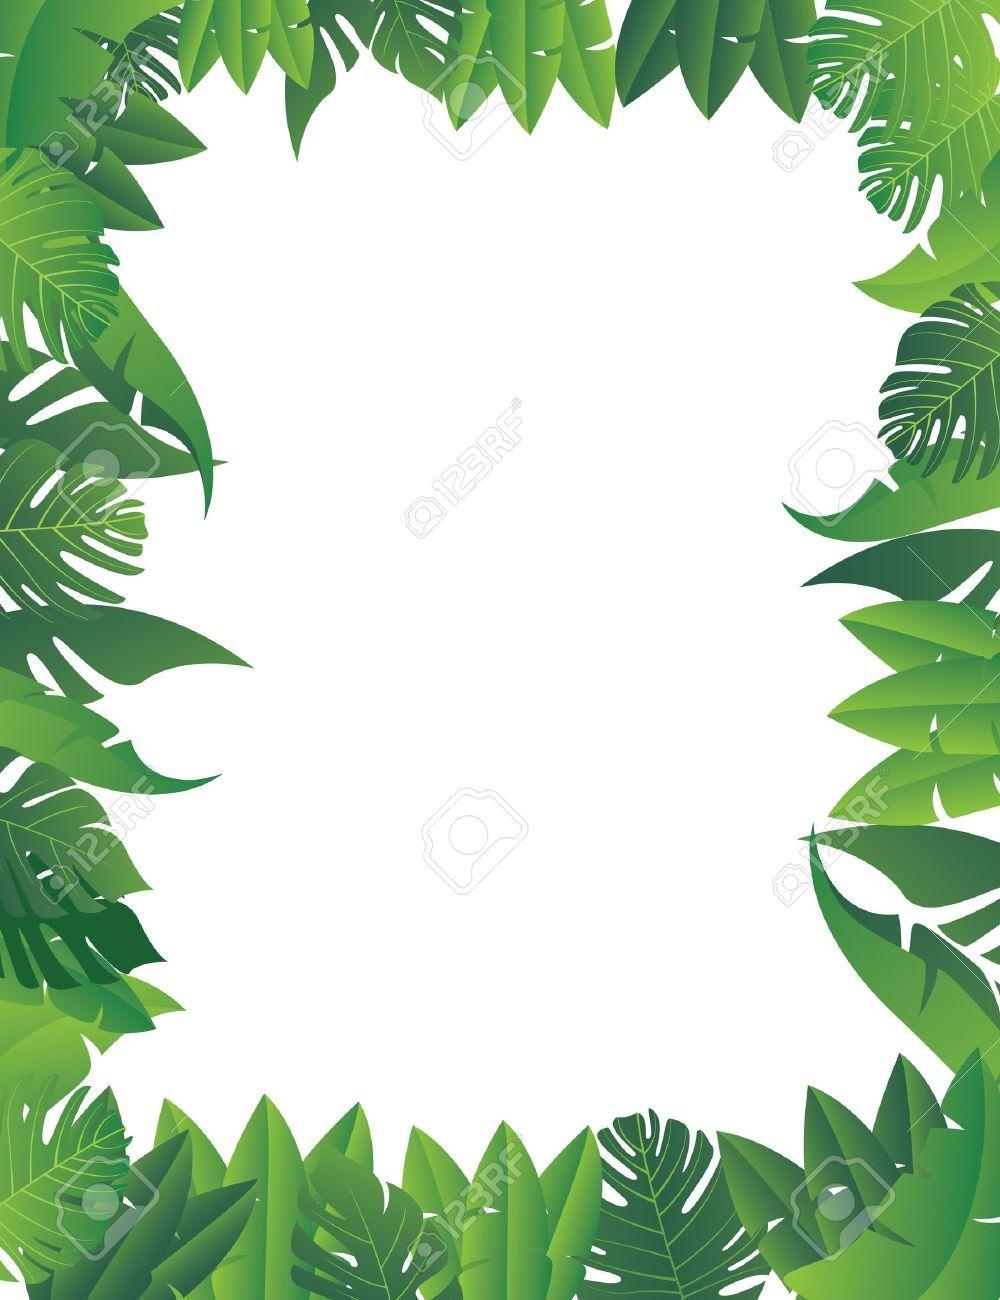 Jungle border clipart png transparent stock Free jungle border clipart 7 » Clipart Portal png transparent stock